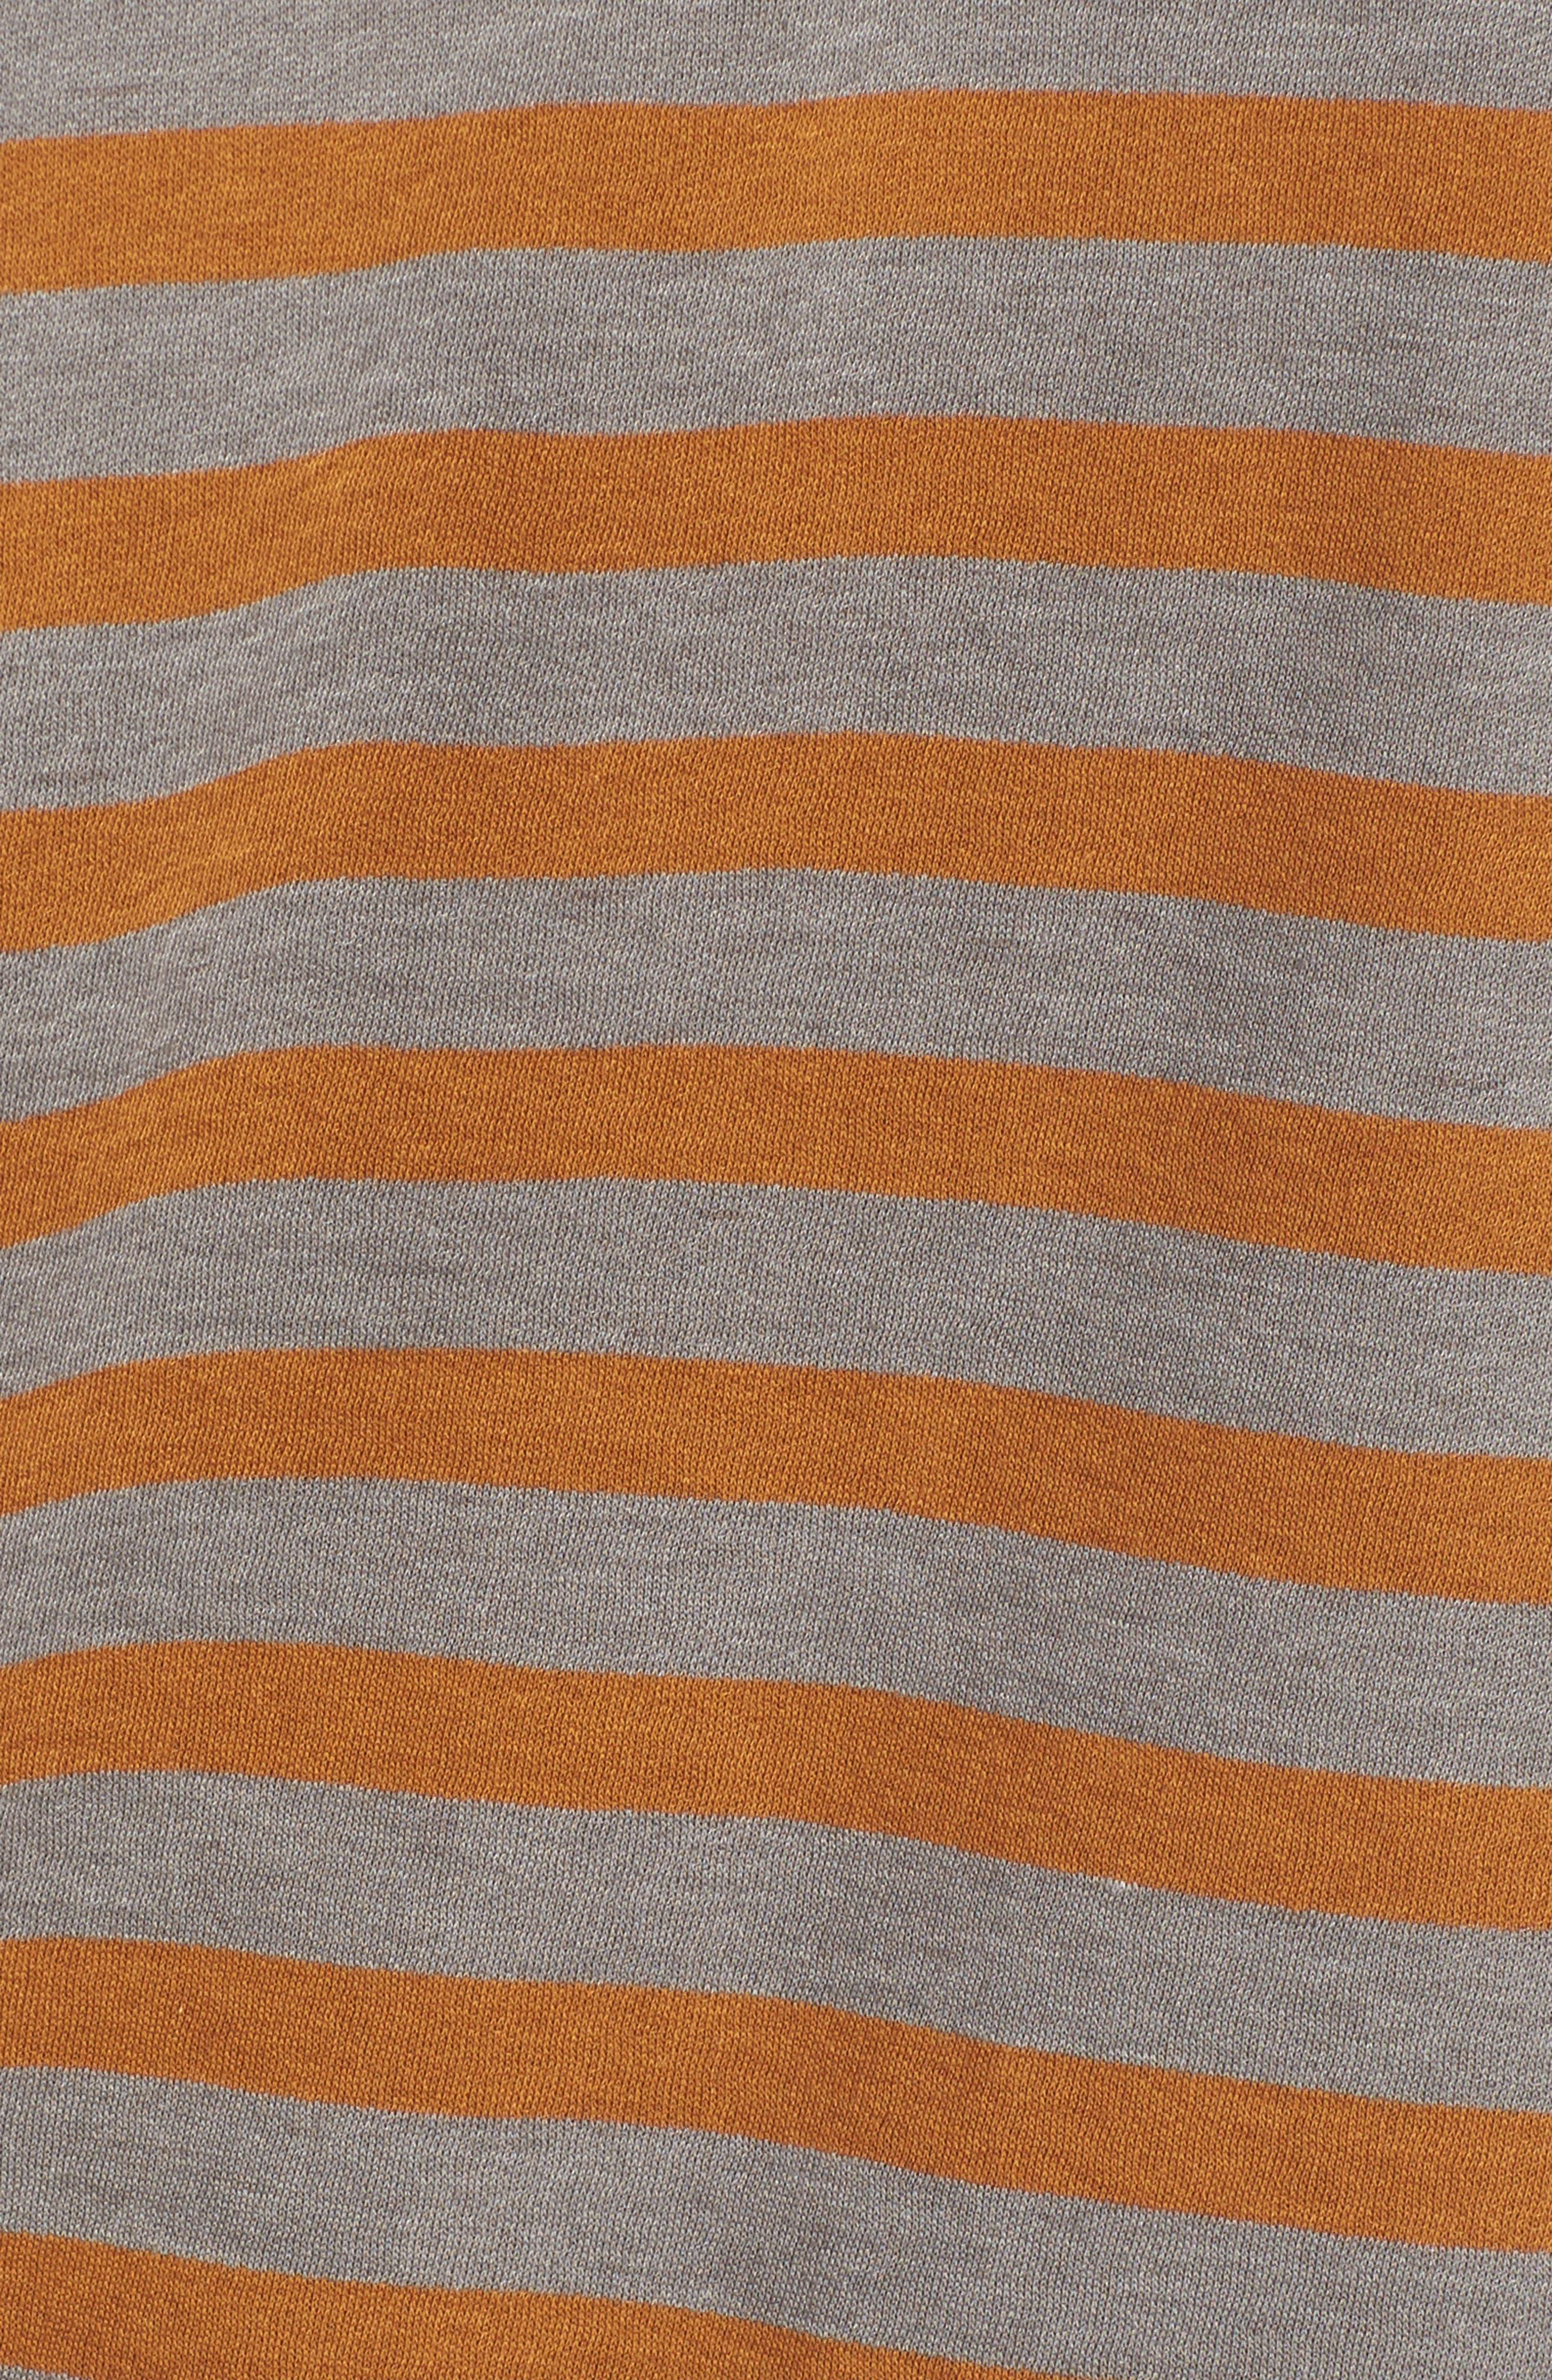 Crewneck Sweatshirt,                             Alternate thumbnail 5, color,                             021